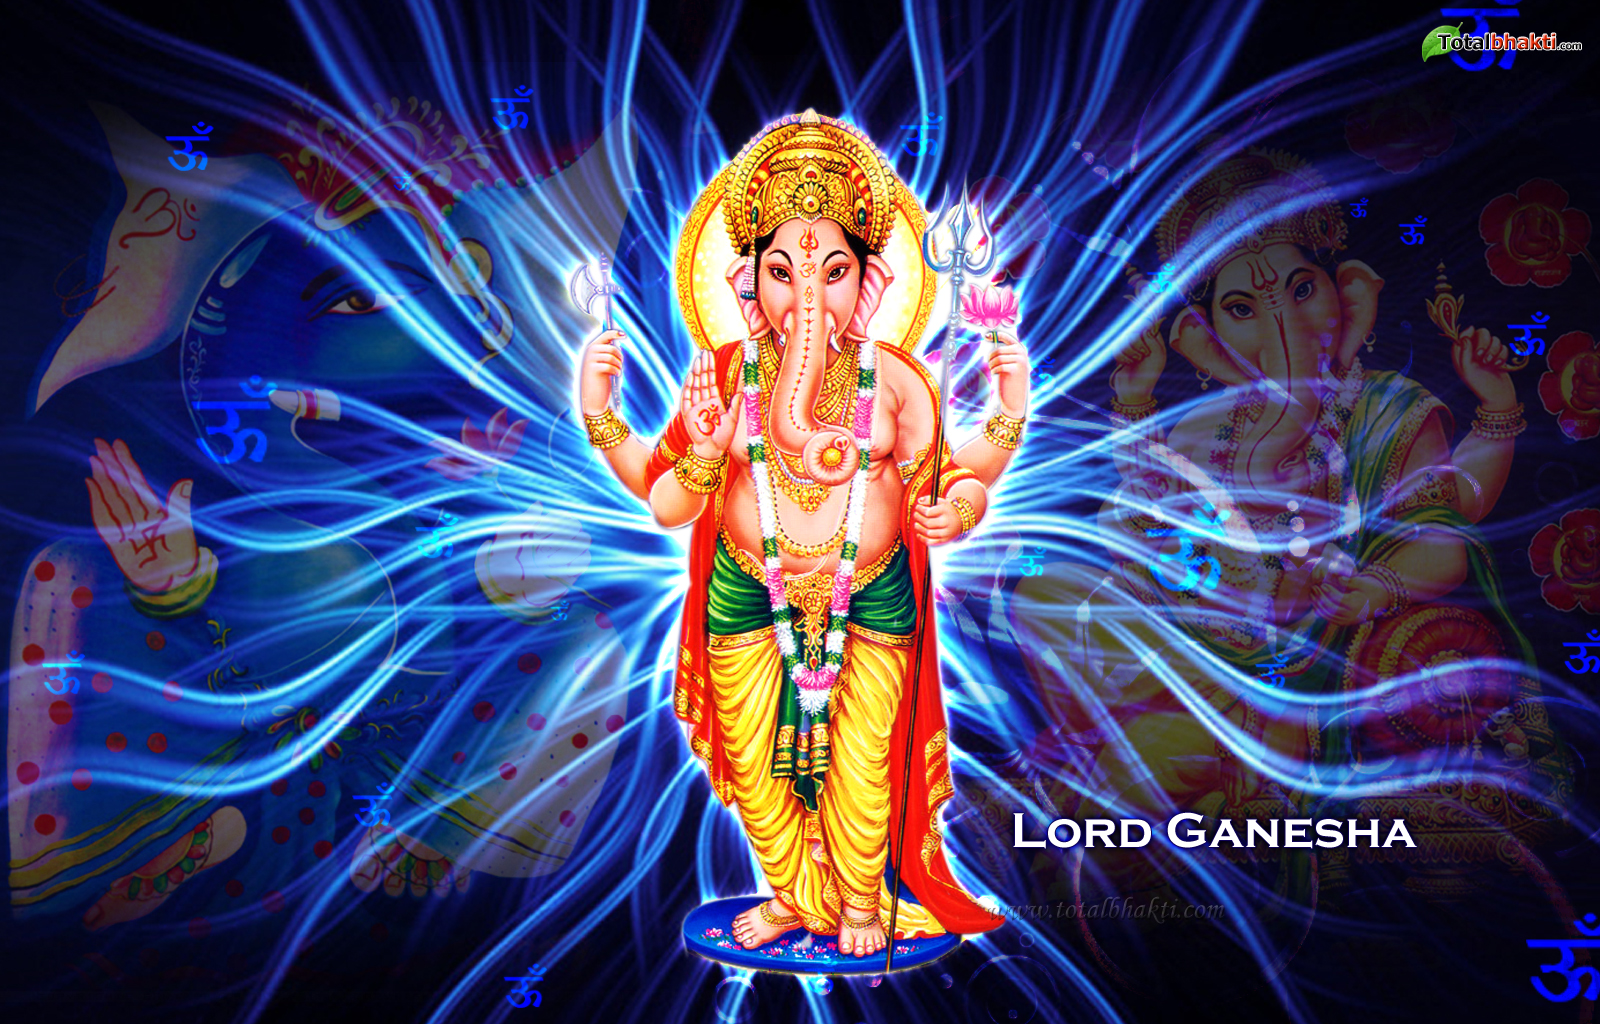 Lord Ganesha Photos: Download As Your Wish: LOAD GANESH